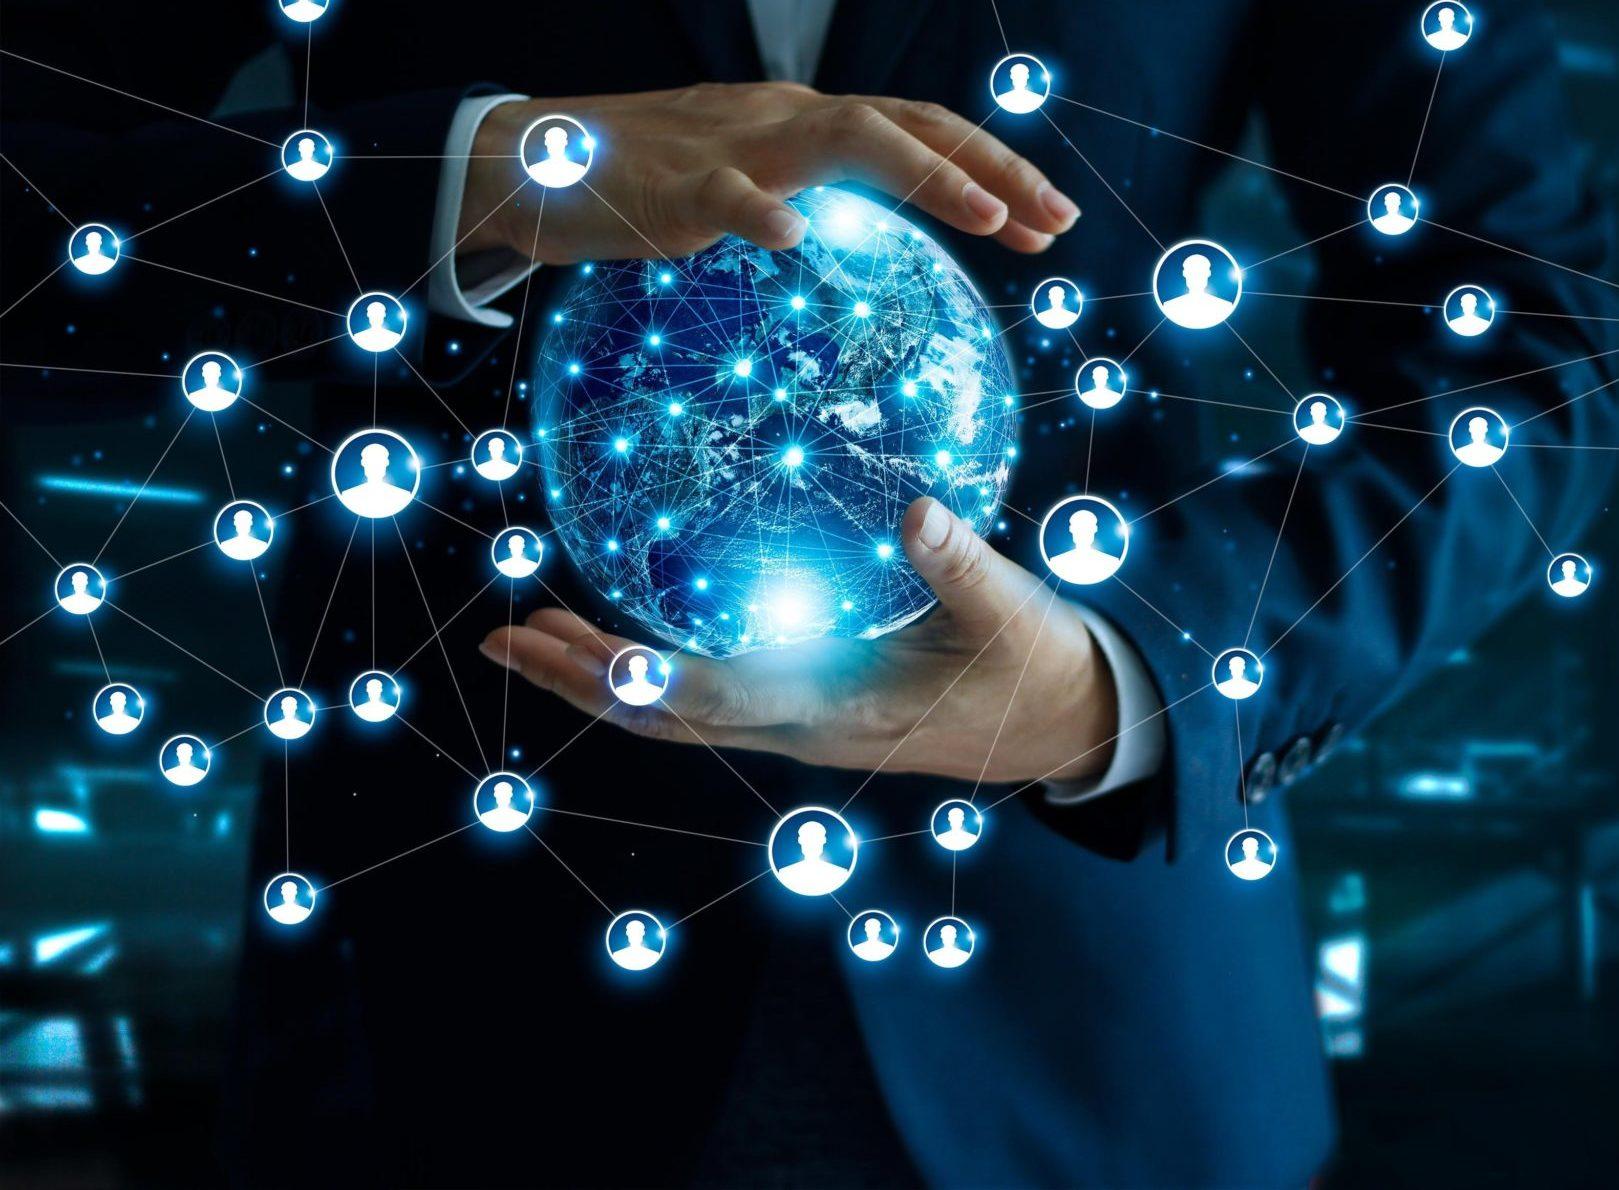 technologia, globalna sieć